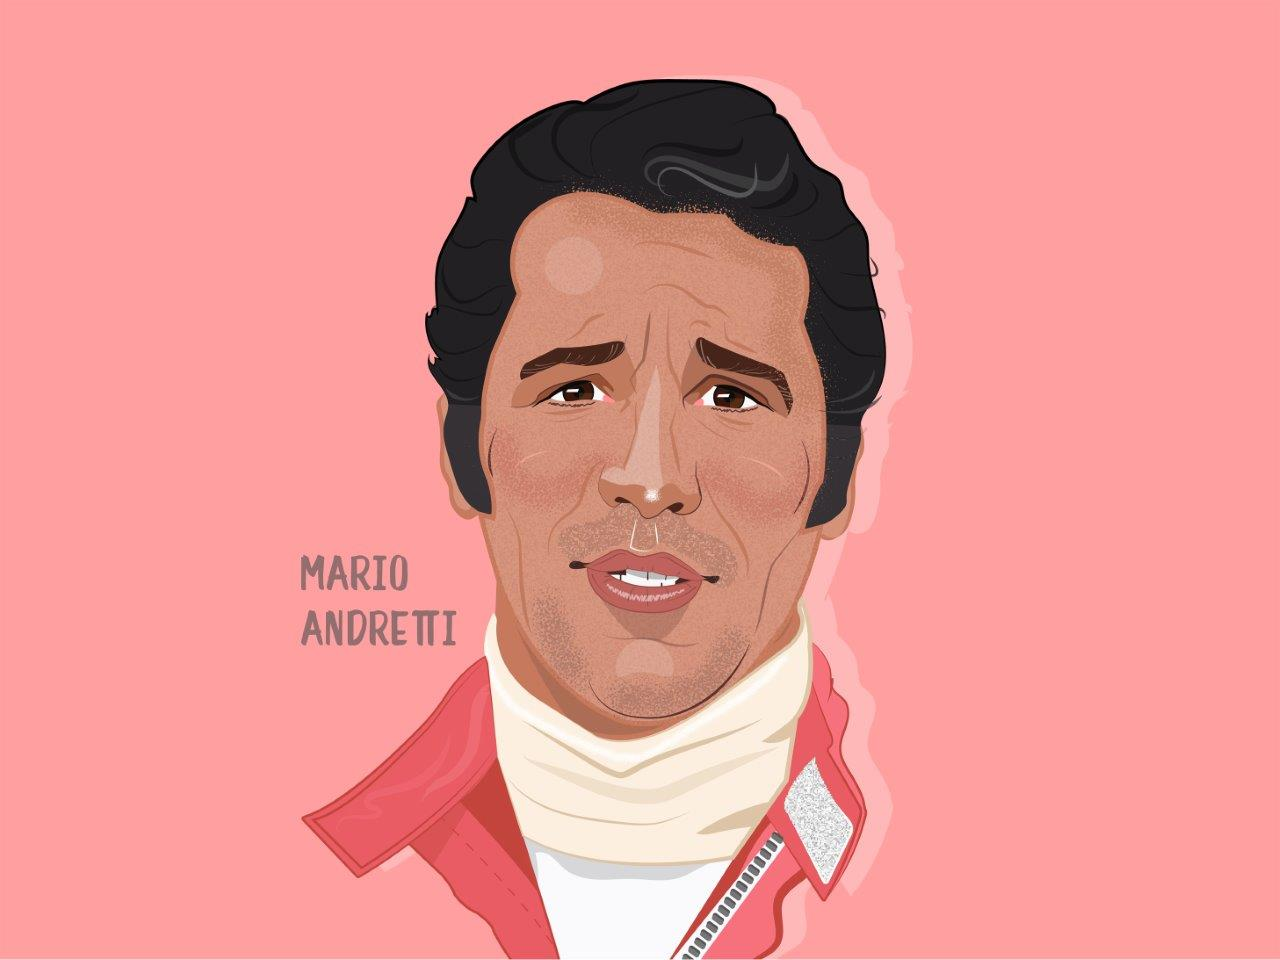 Mario Andretti Illustration